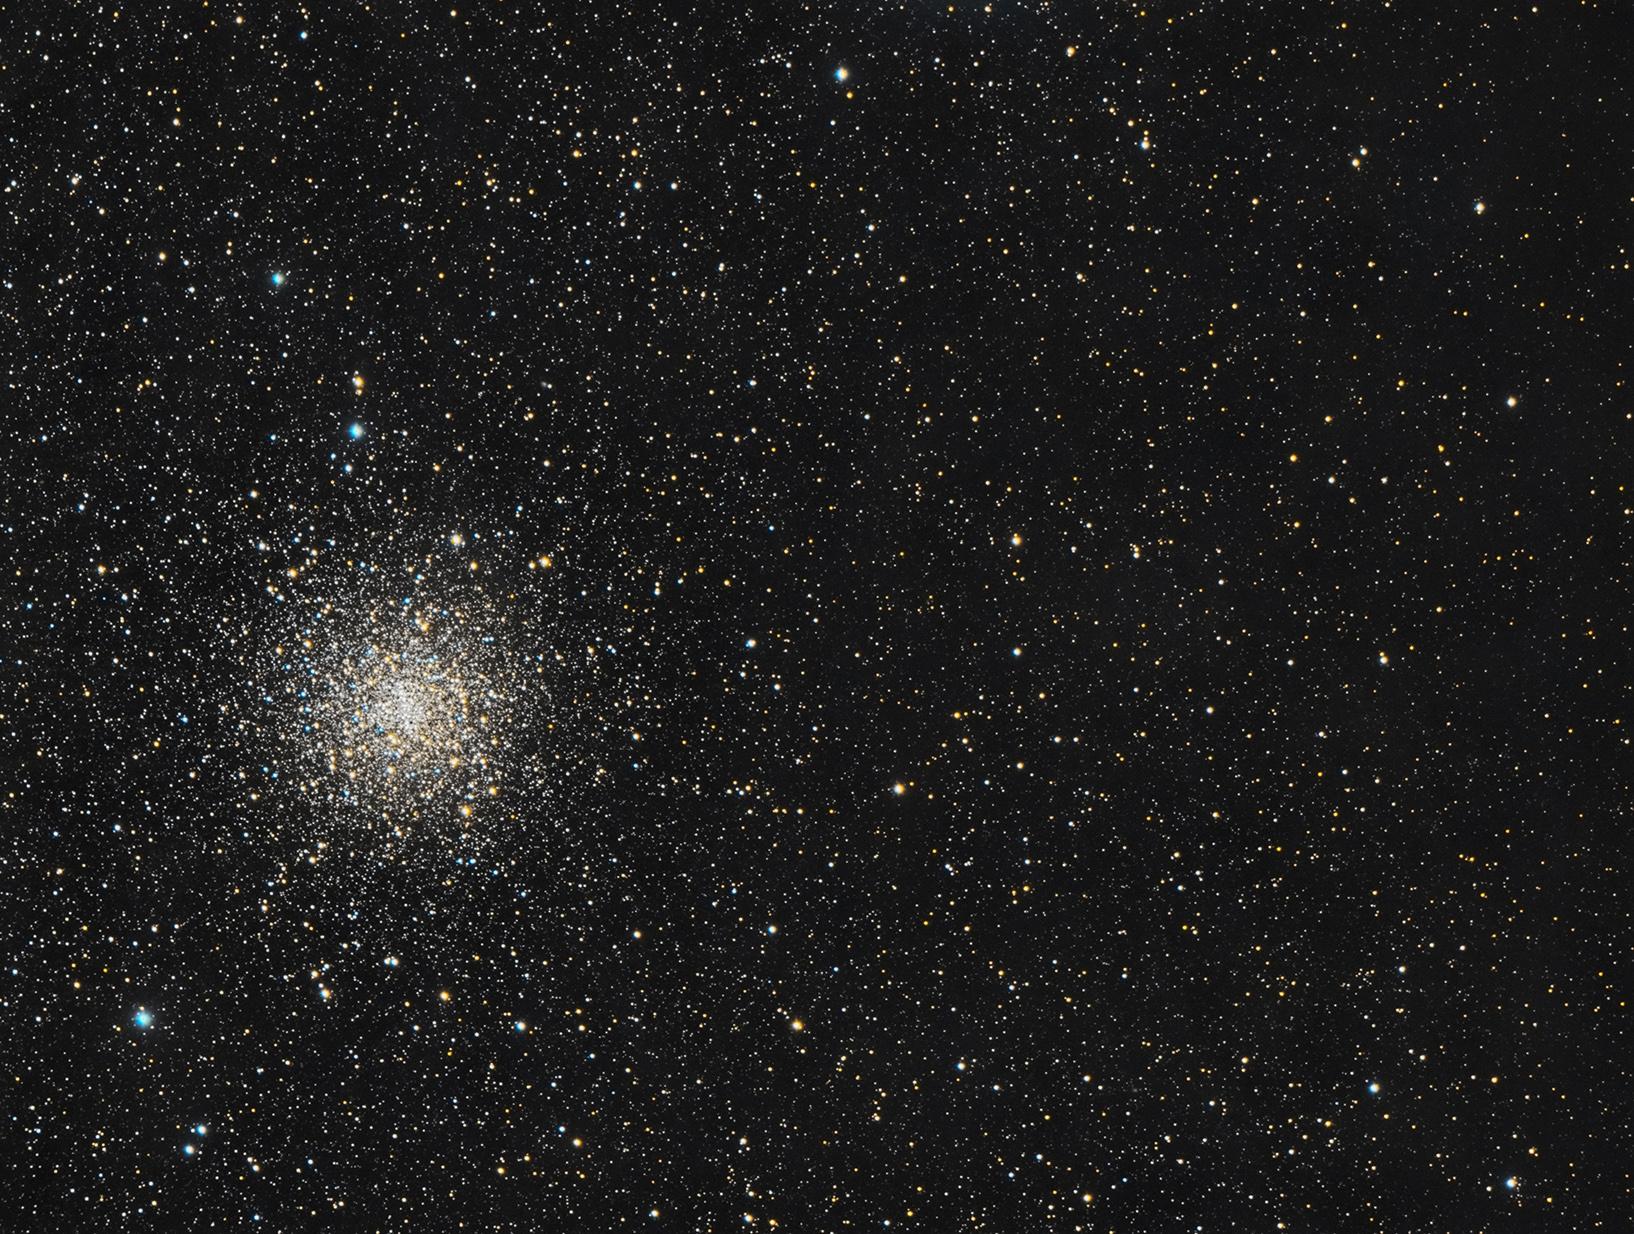 m4-1634x1234-svs130f5.jpg